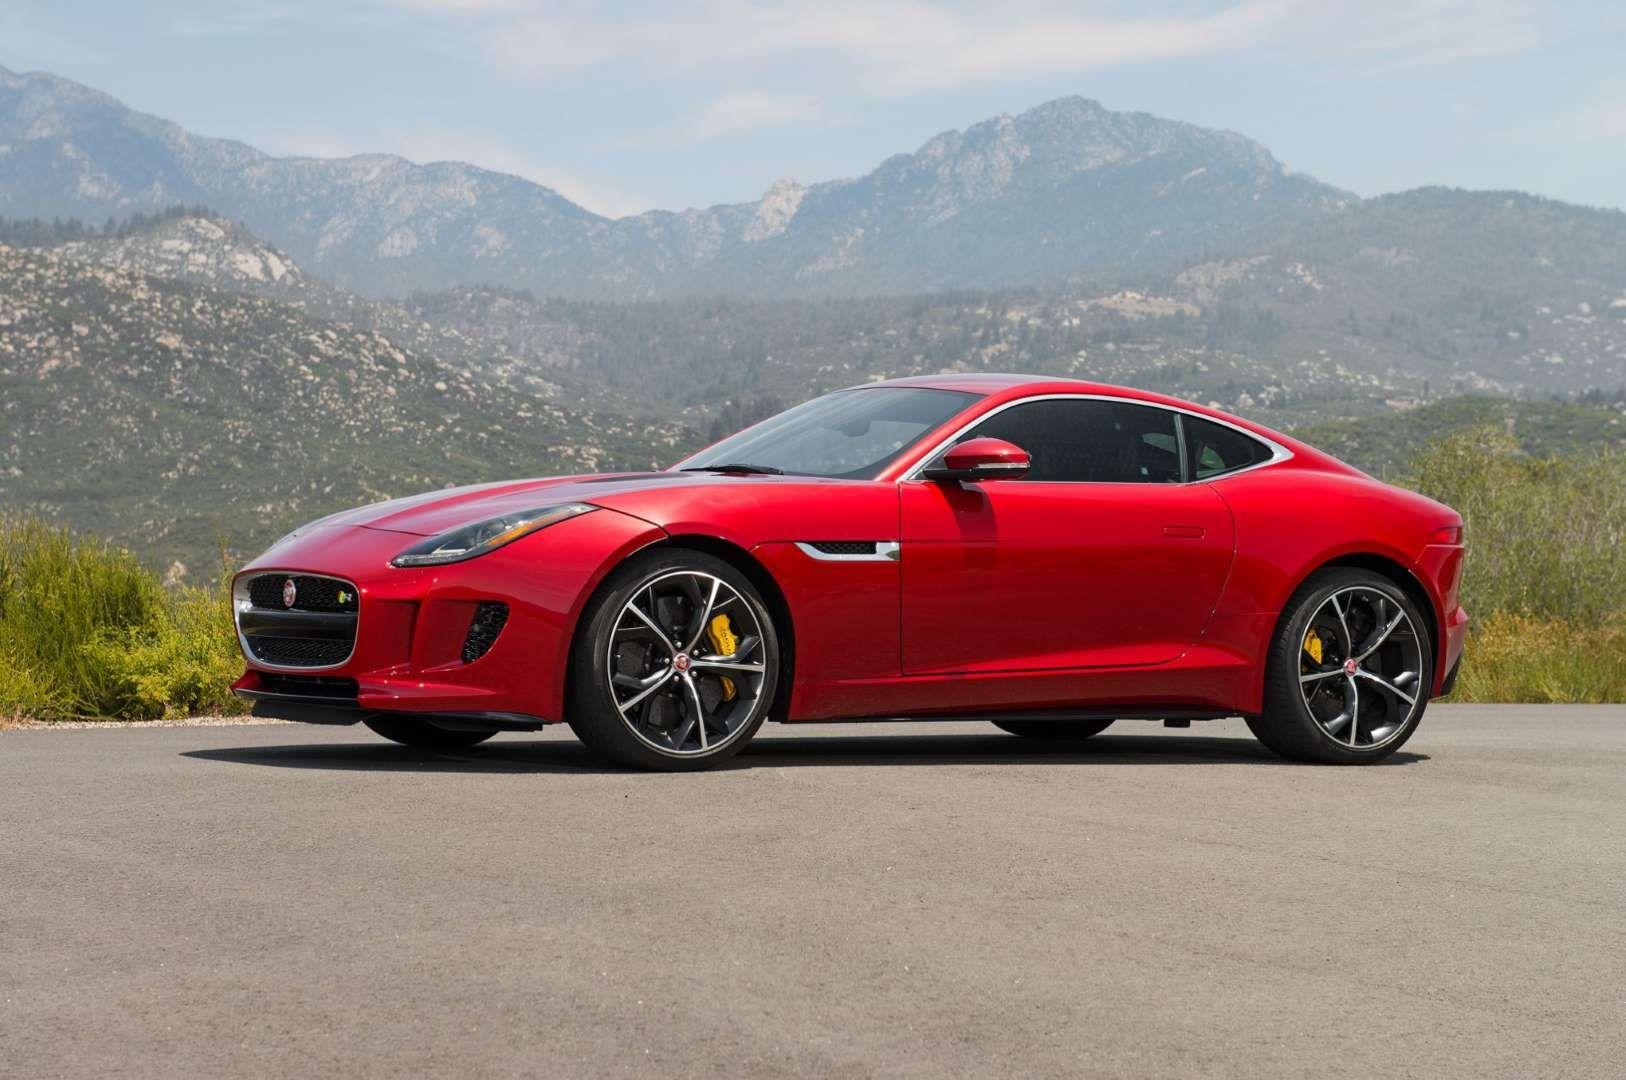 2015 Jaguar F Type R Coupe Base Price 65,92599,925